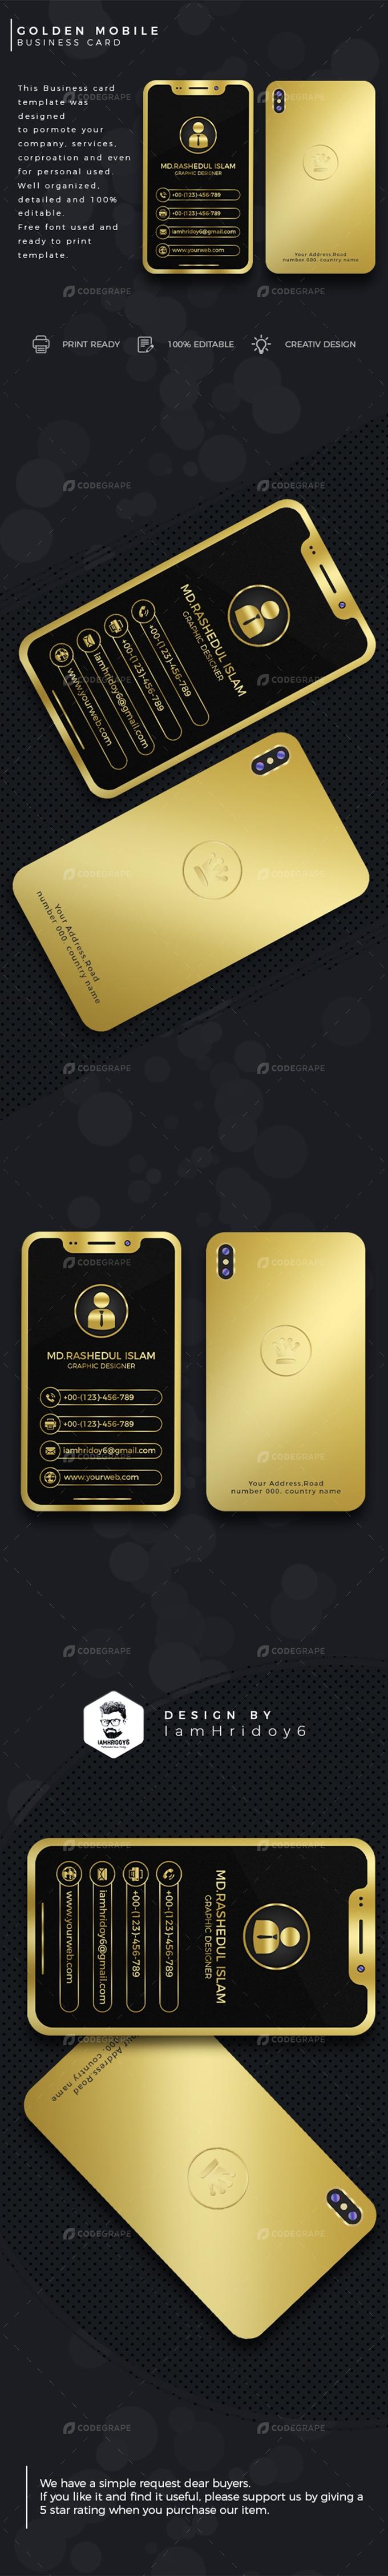 Golden Mobile Business Card - Print | CodeGrape